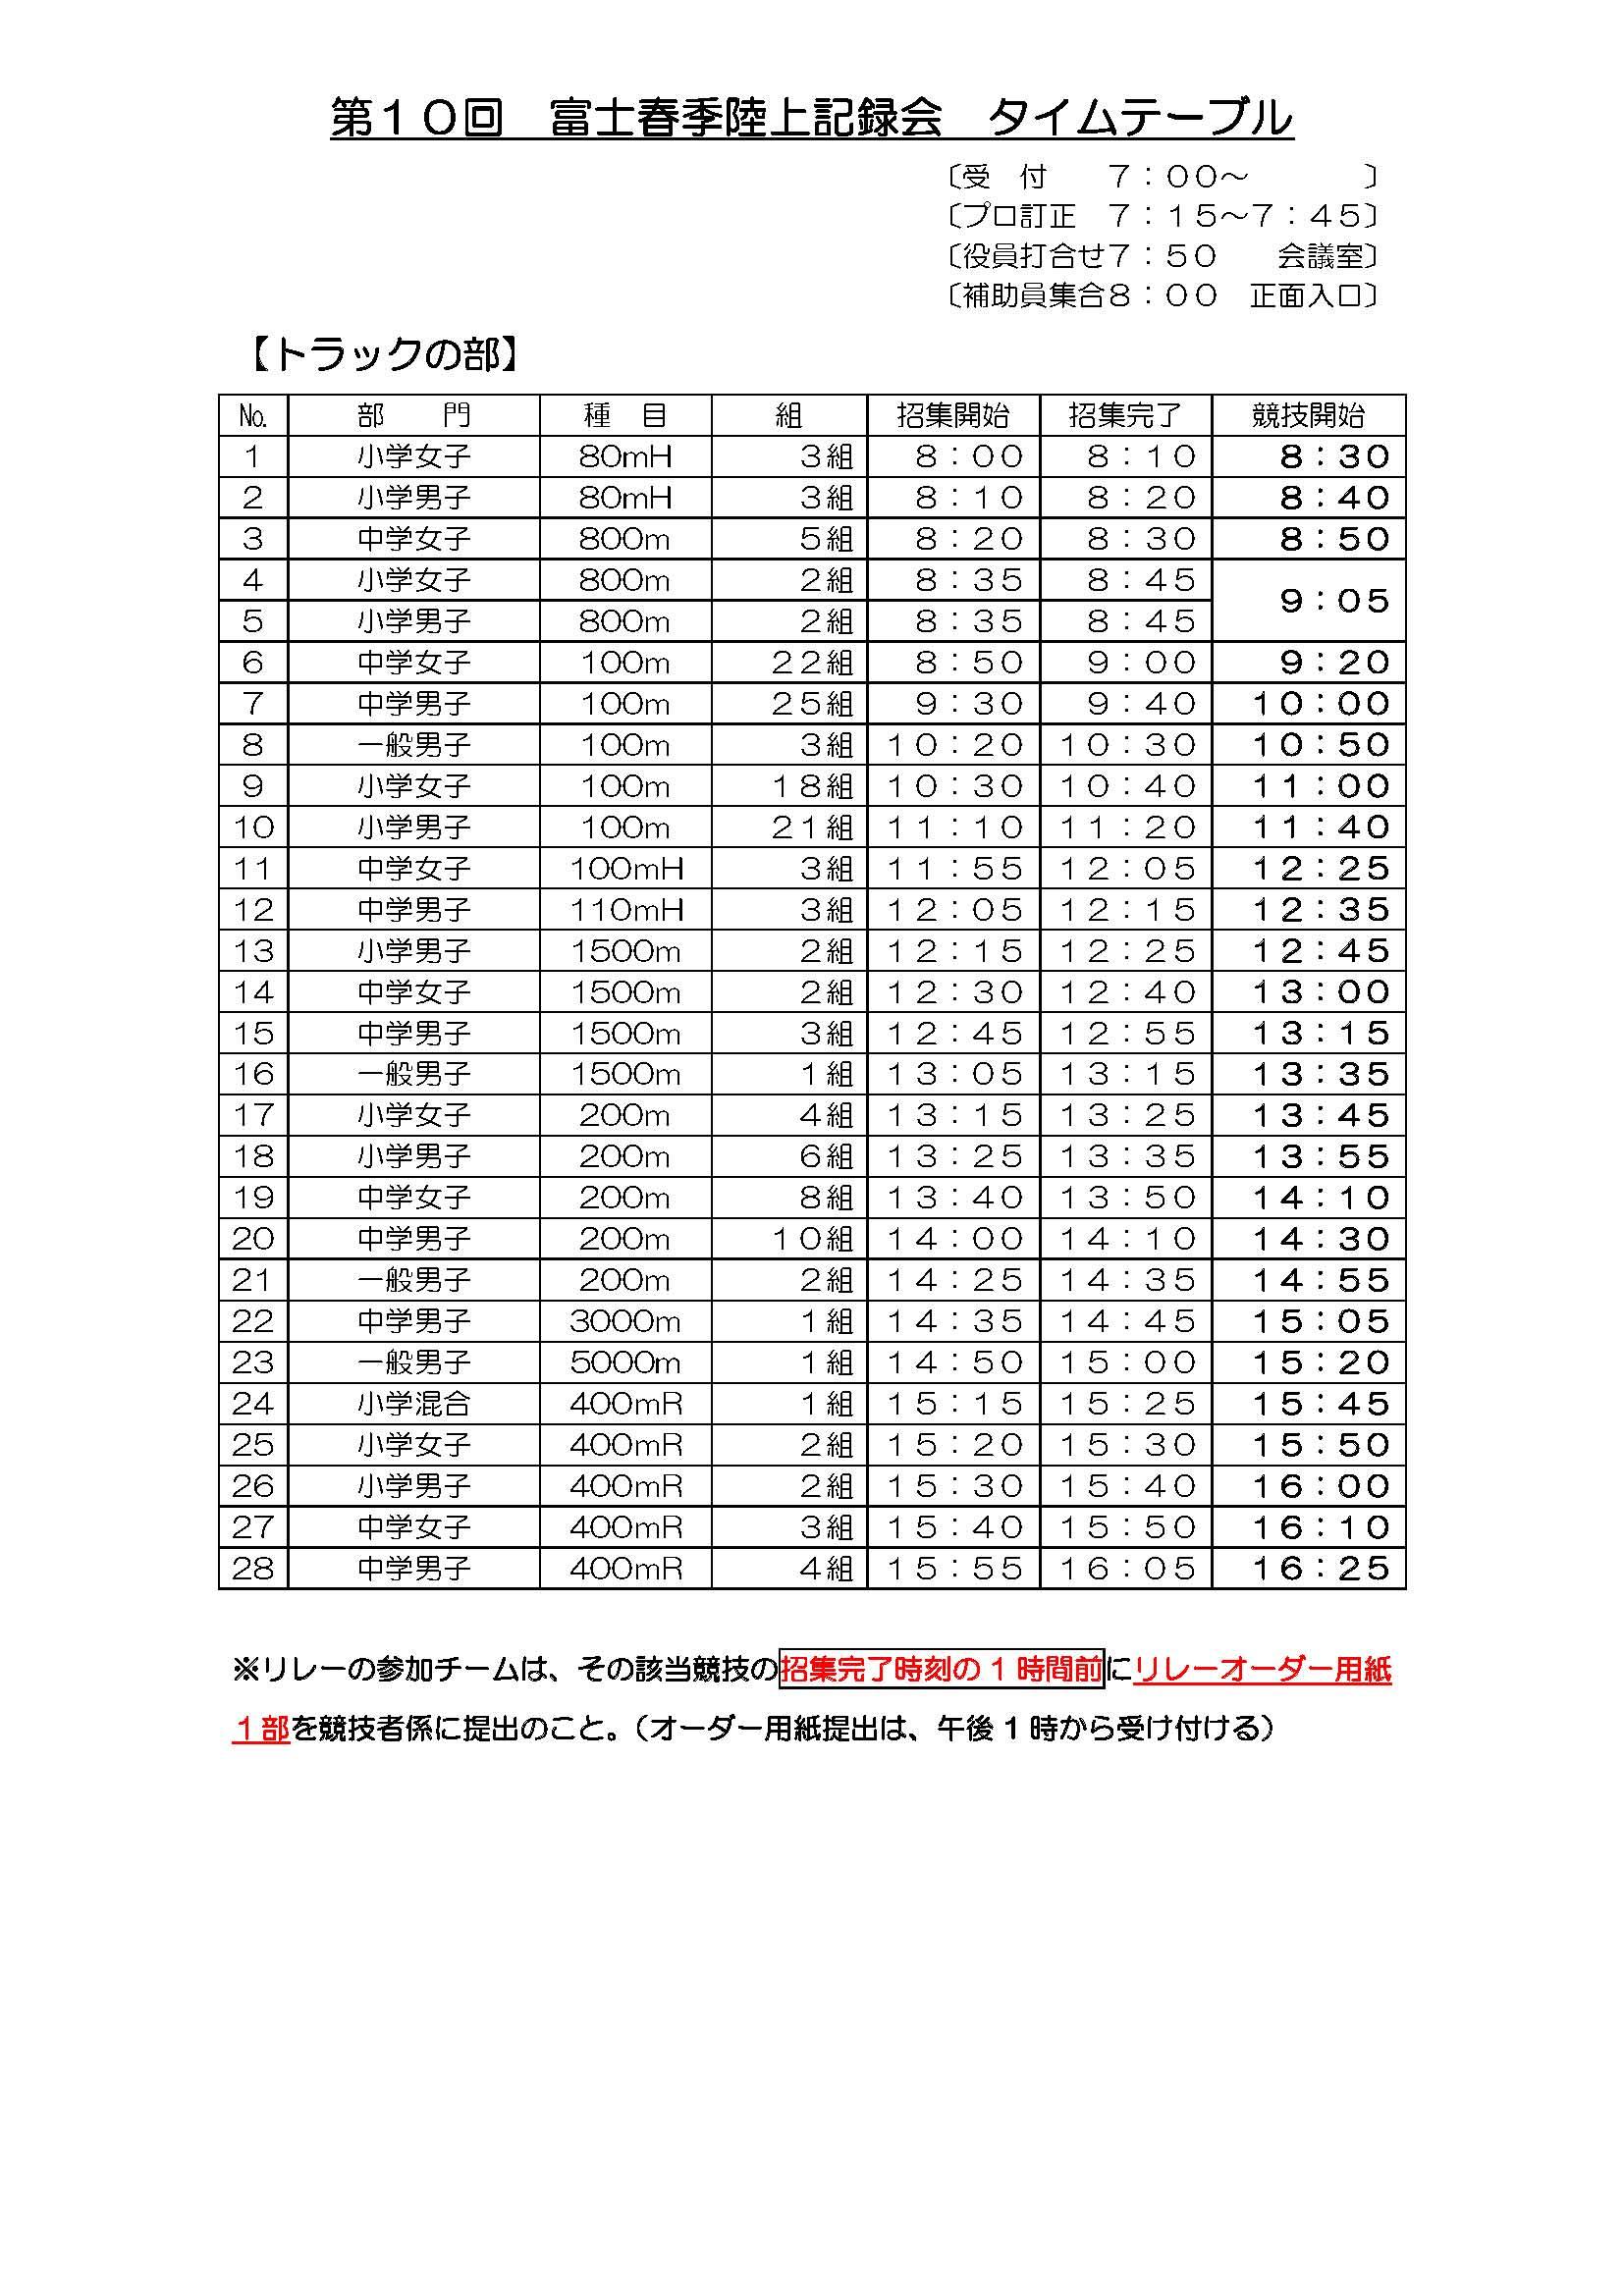 fuji_10_ページ_1